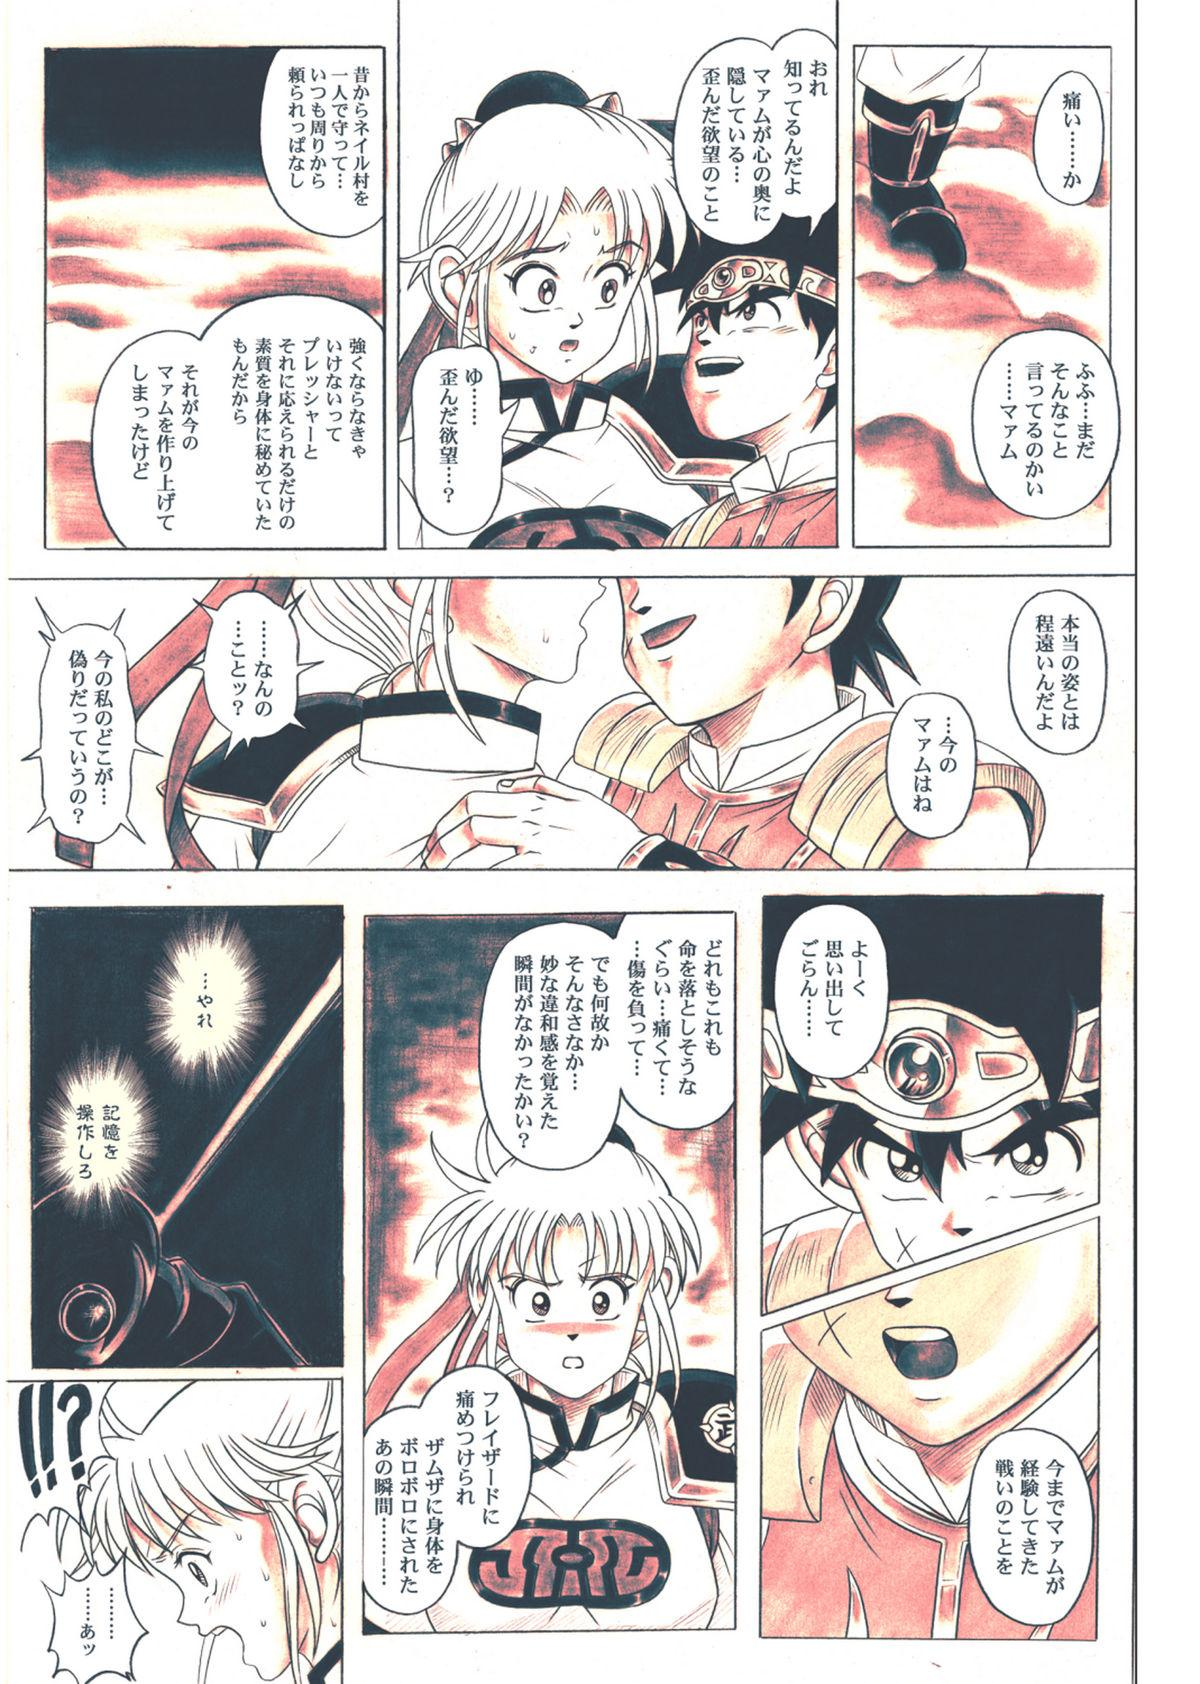 [Cyclone (Reizei, Izumi)] STAR TAC IDO ~Youkuso Haja no Doukutsu he~ Chuuhen Download edition (Dragon Warrior: Dai's Great Adventure) [Digital] 116